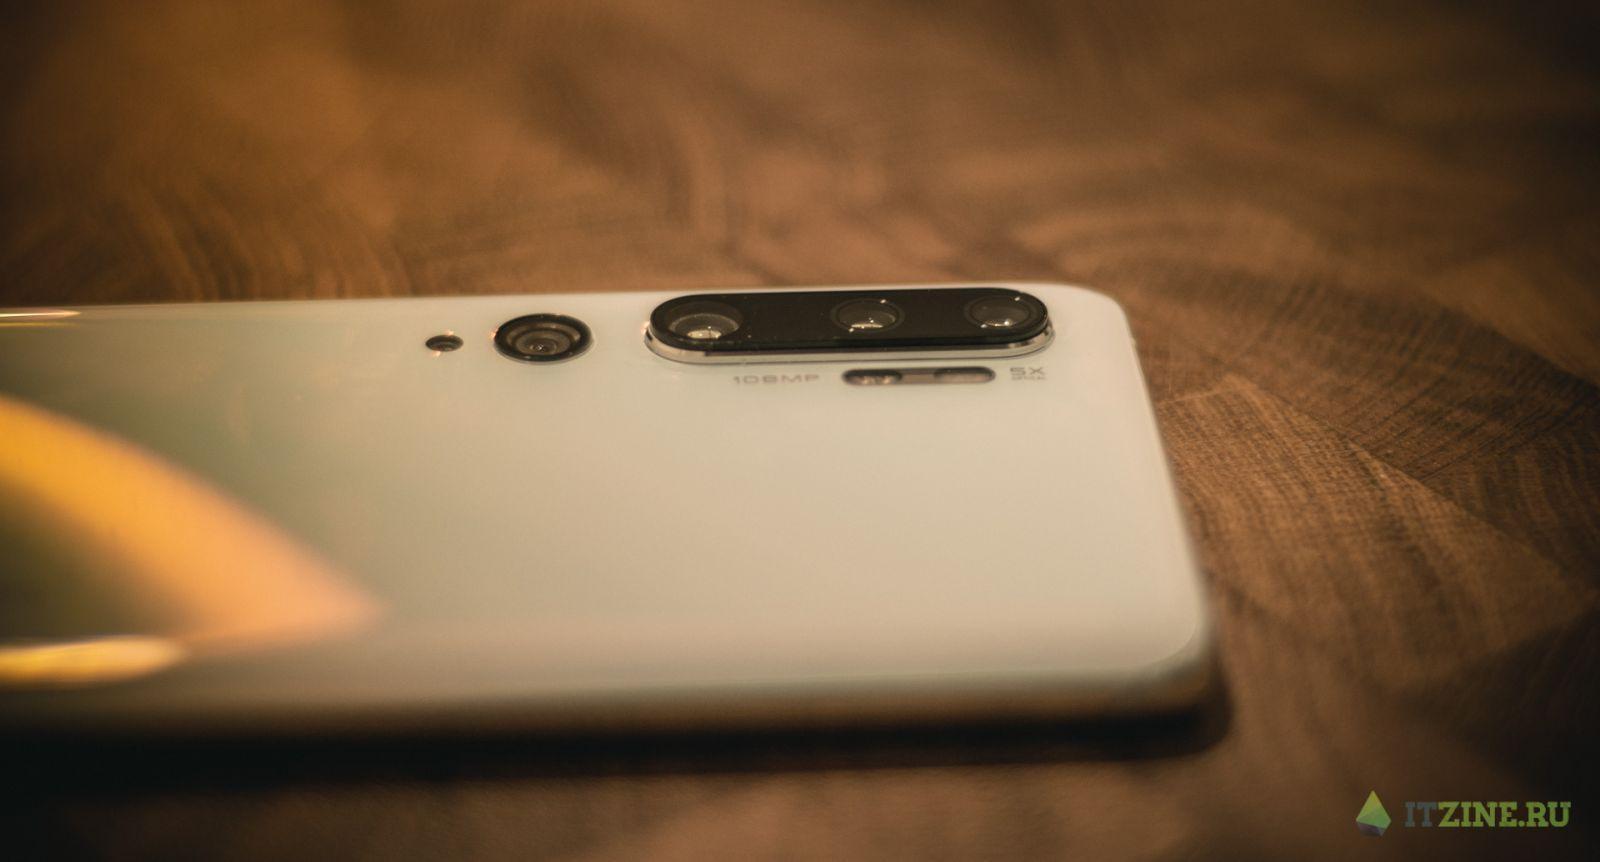 Обзор Xiaomi Mi Note 10 Pro. Добротный флагман (dsc 8079)